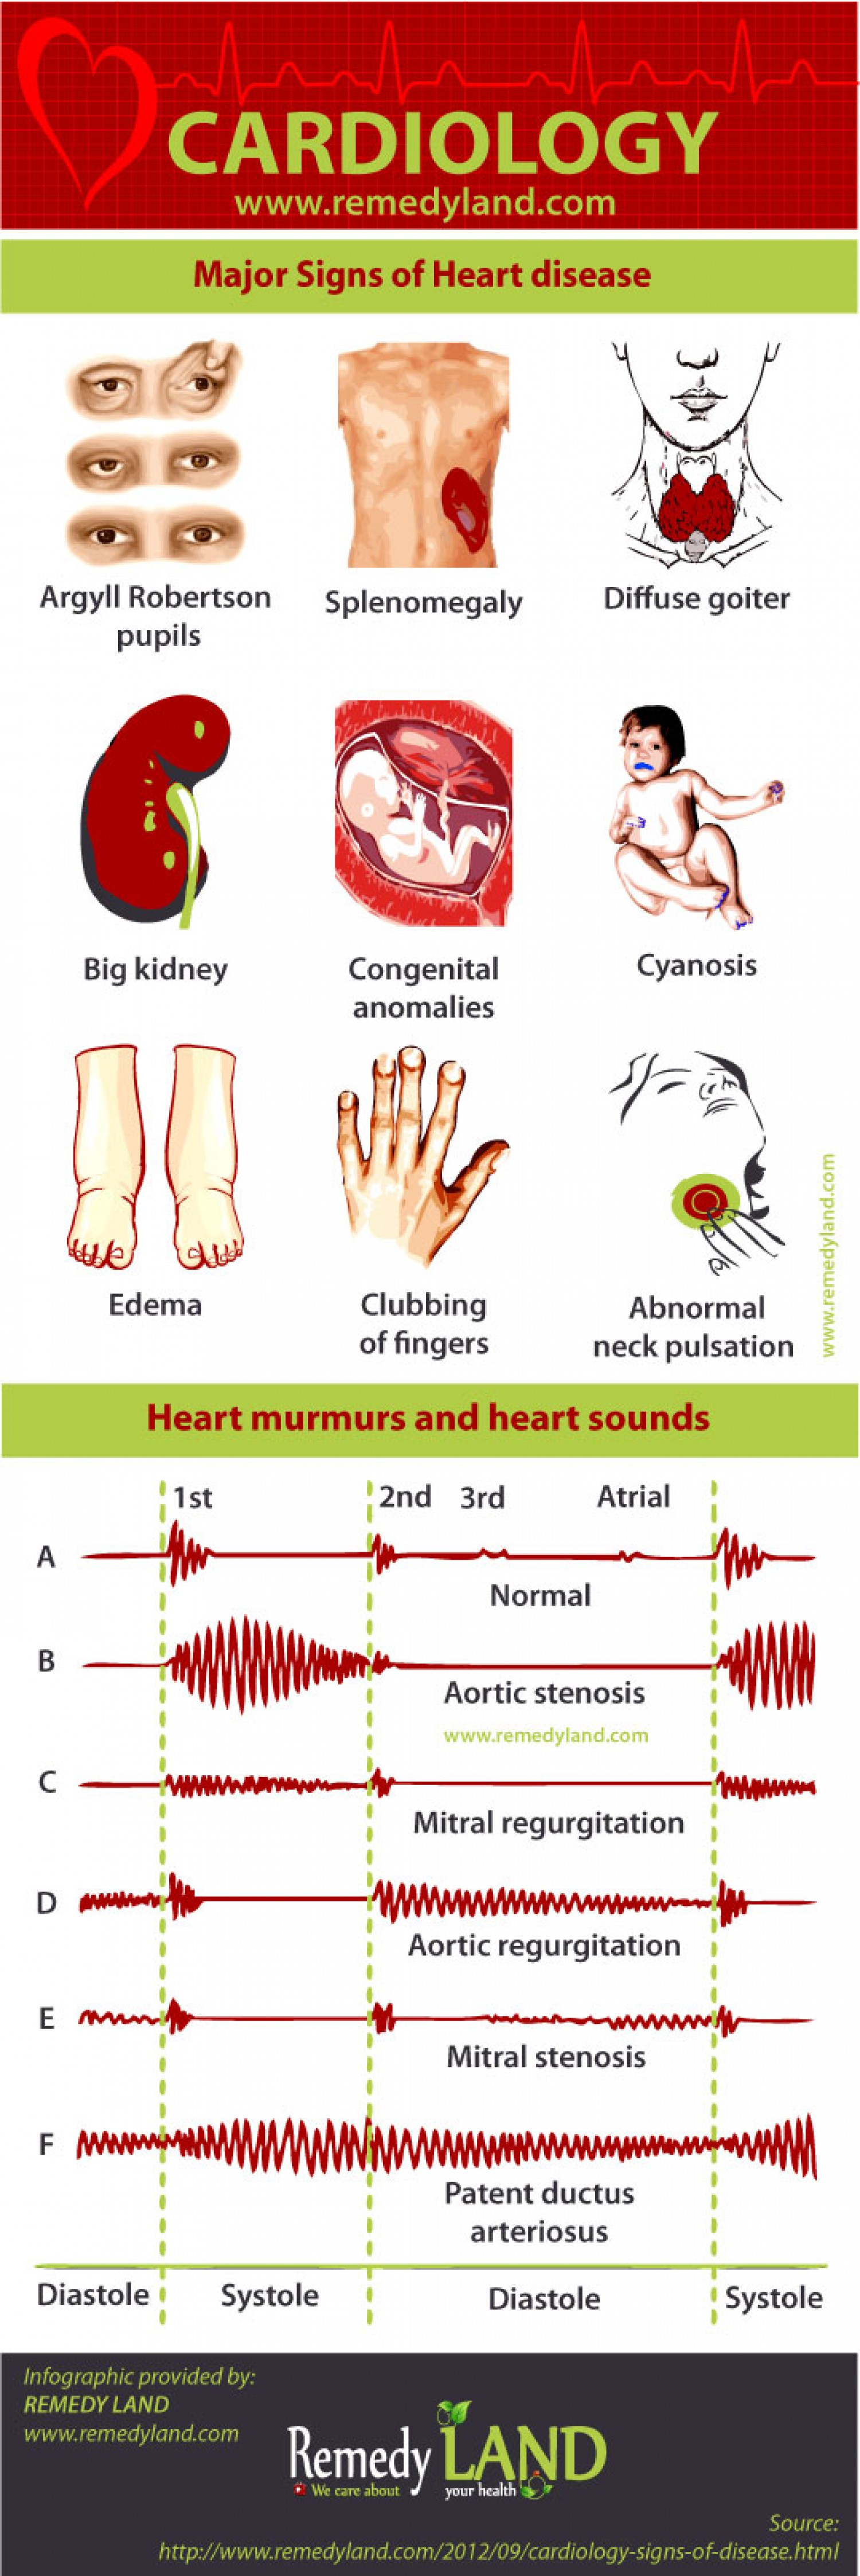 Major Signs of Heart Disease